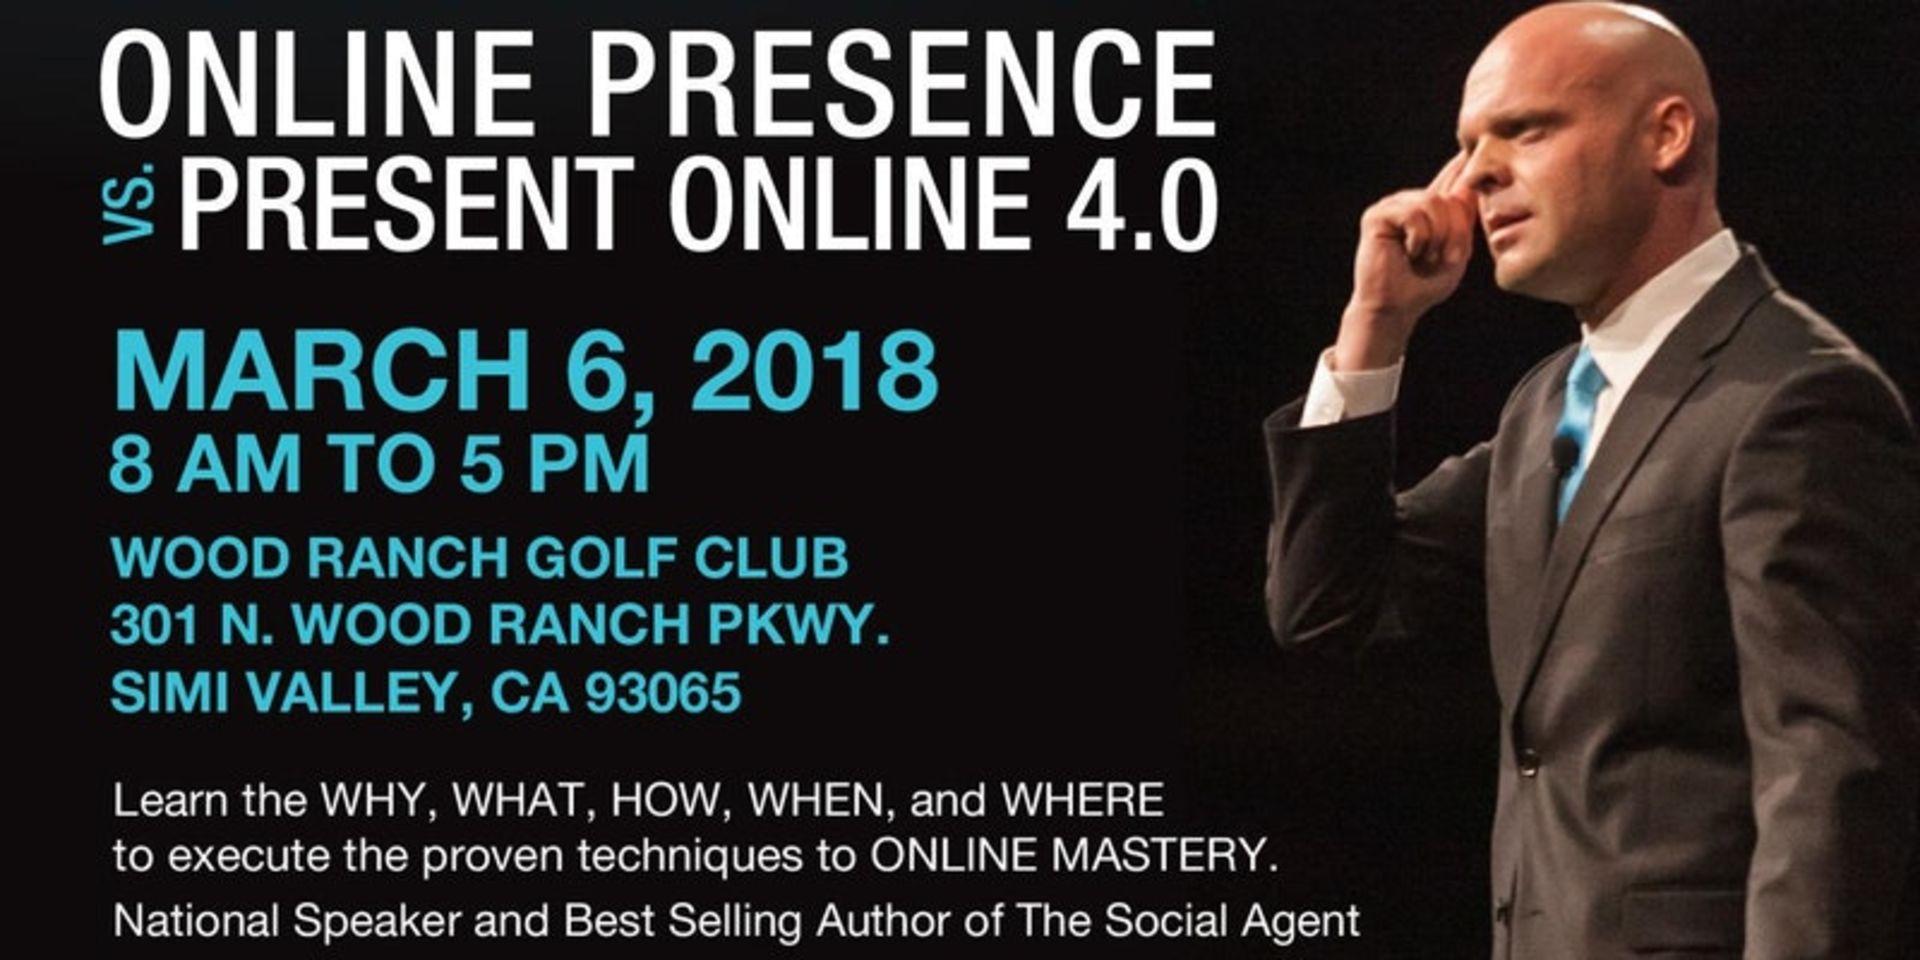 Tony Giordano: Online Presence vs. Present Online